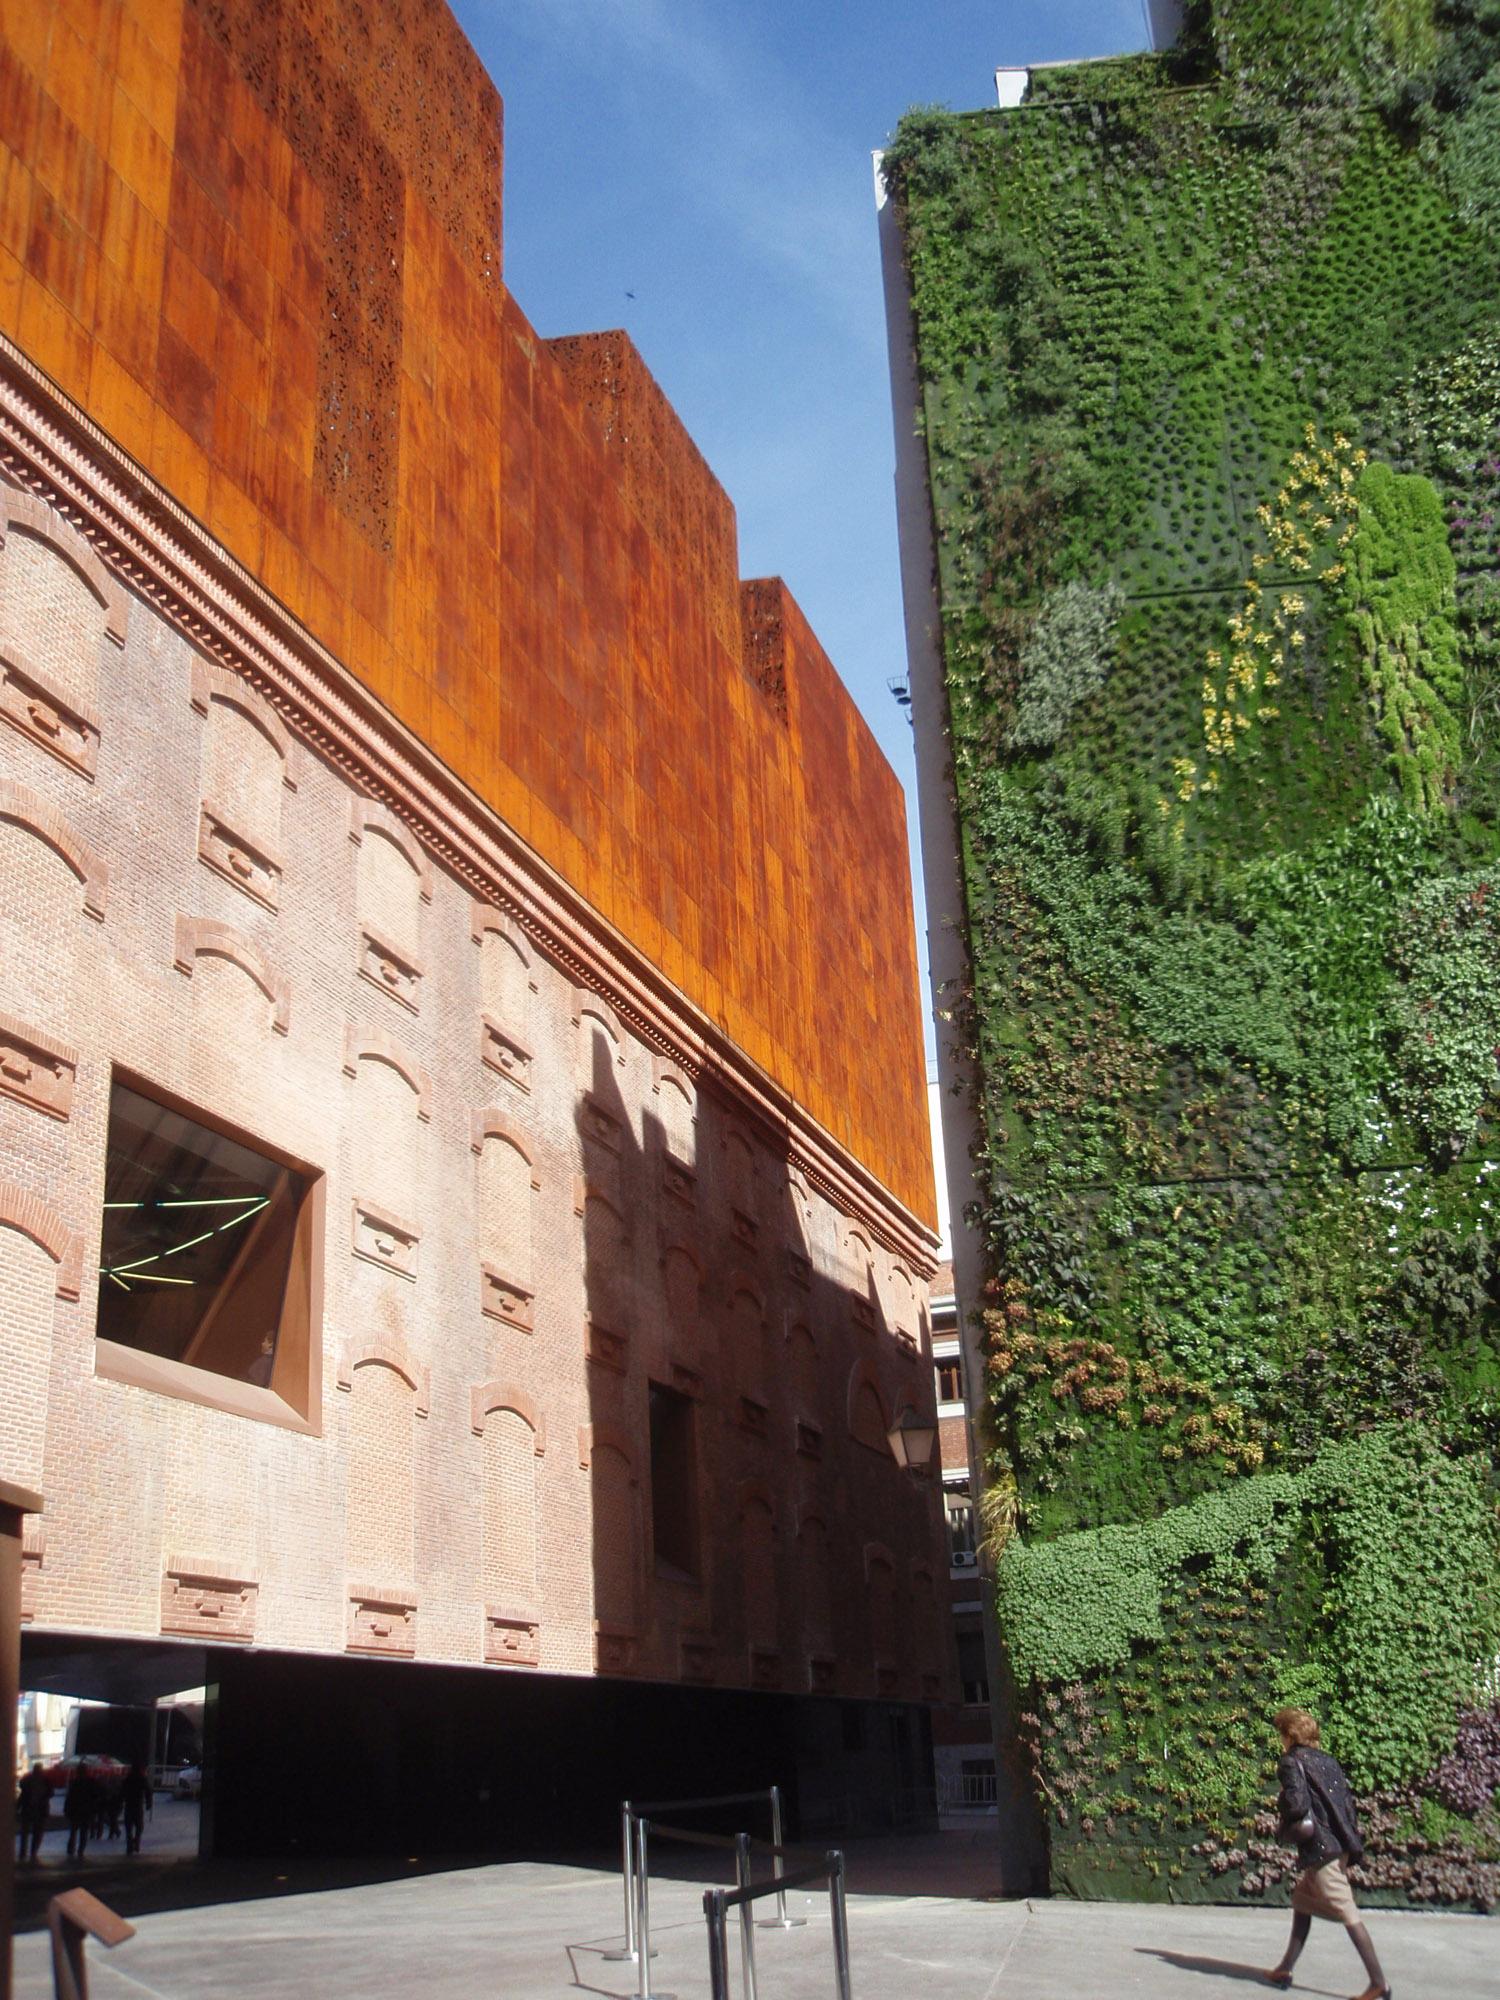 Architettura A Madrid ✅ caixa forum madrid - data, photos & plans - wikiarquitectura